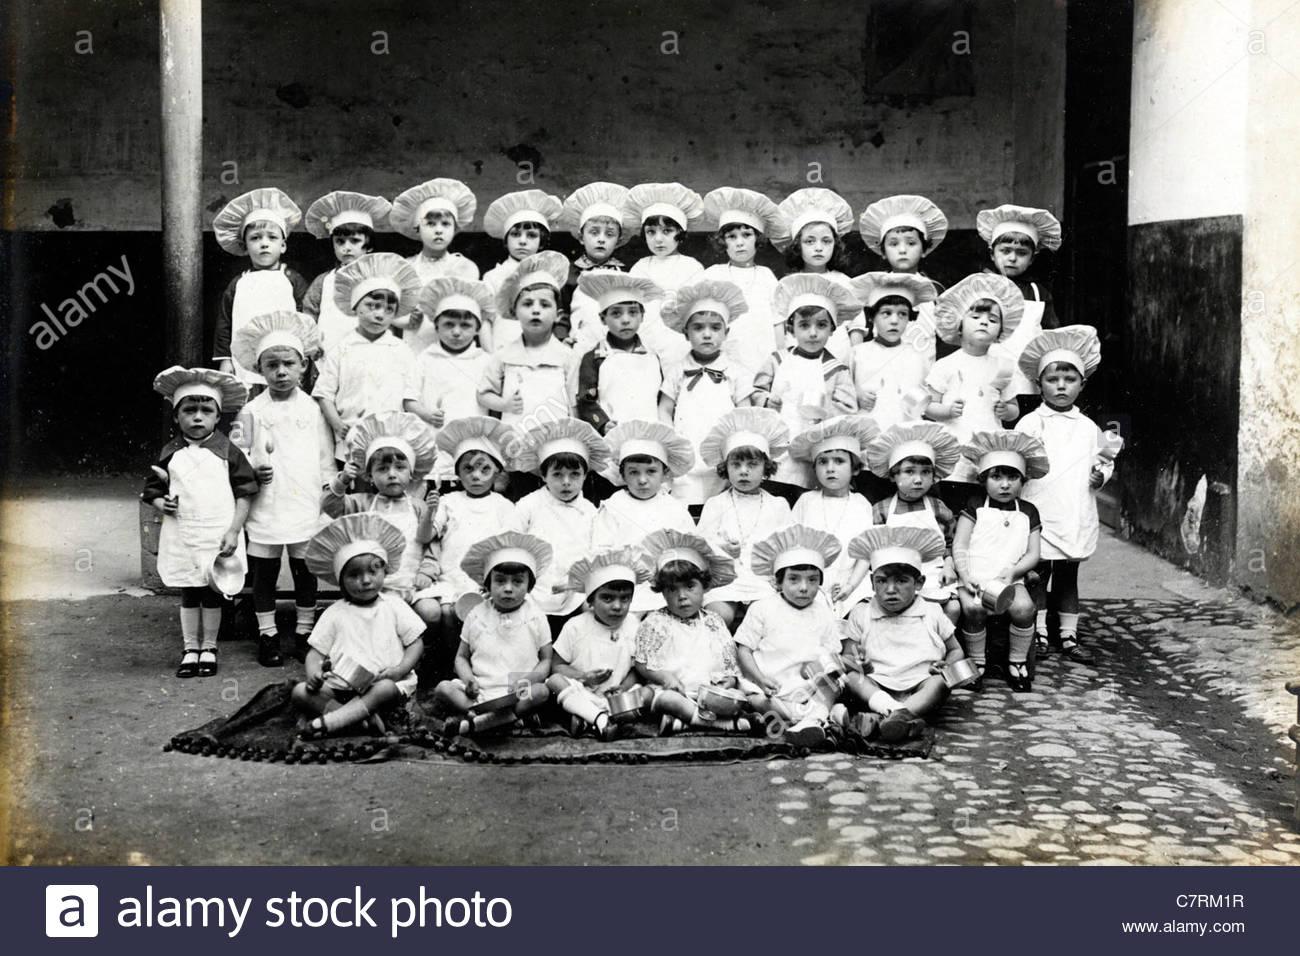 vintage formal group photo of little children dressed up as cook France - Stock Image